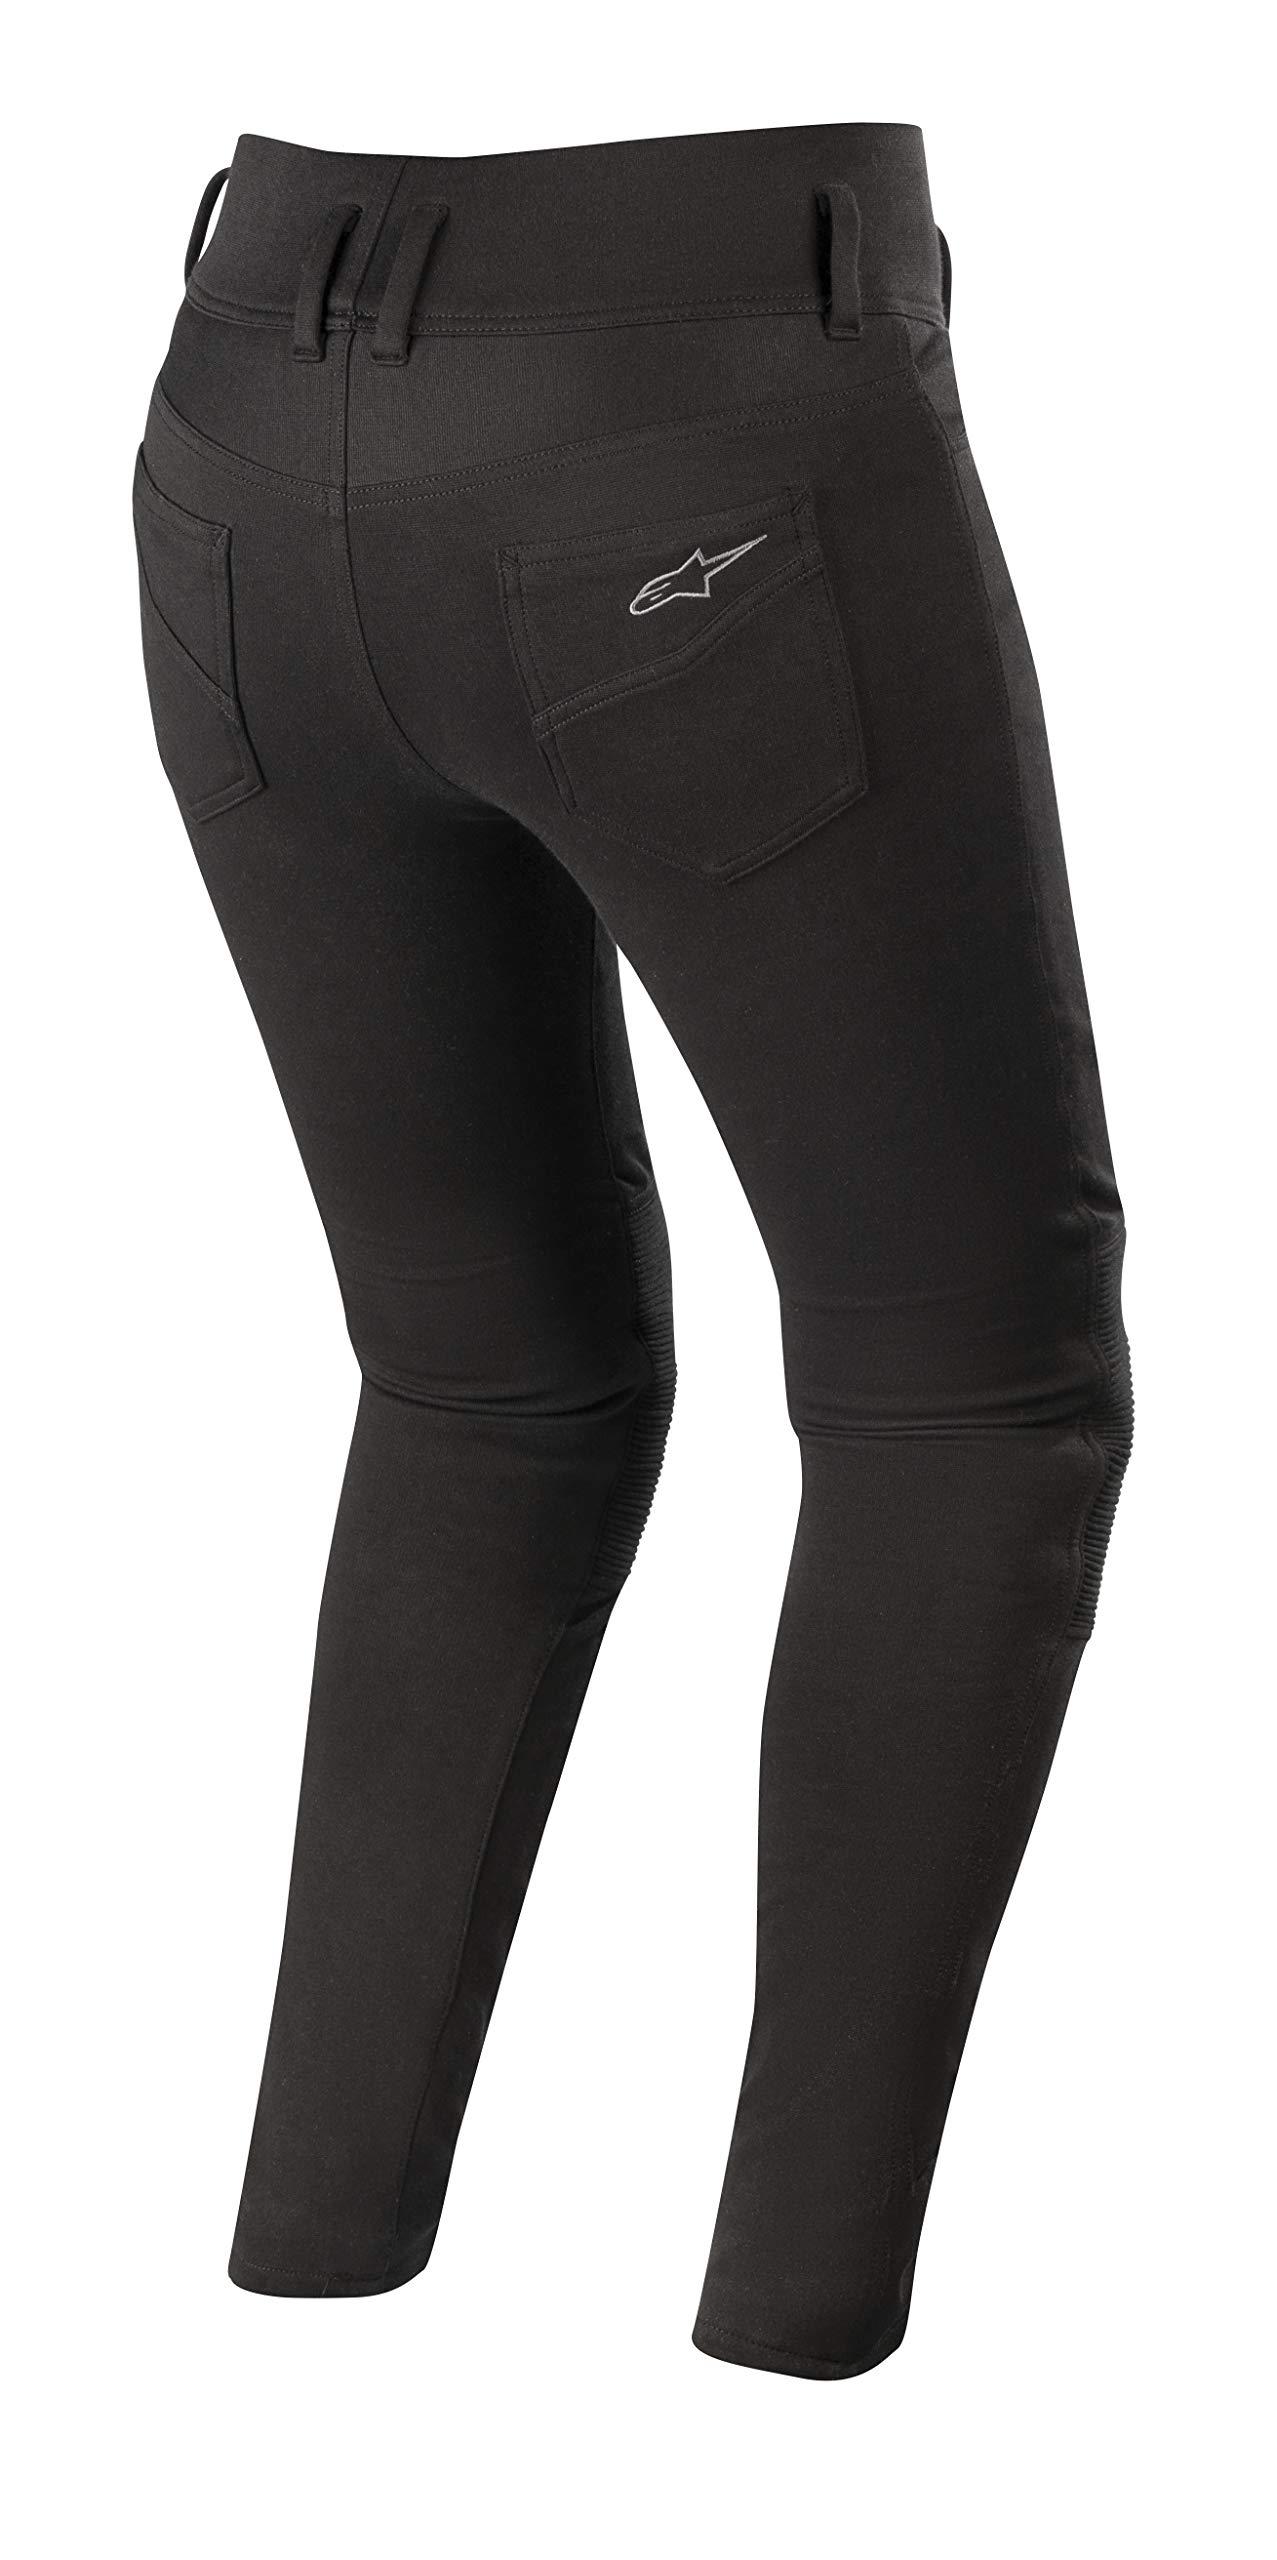 Banshee Women's Protective Motorcycle Leggings (Medium, Black) by Alpinestars (Image #2)